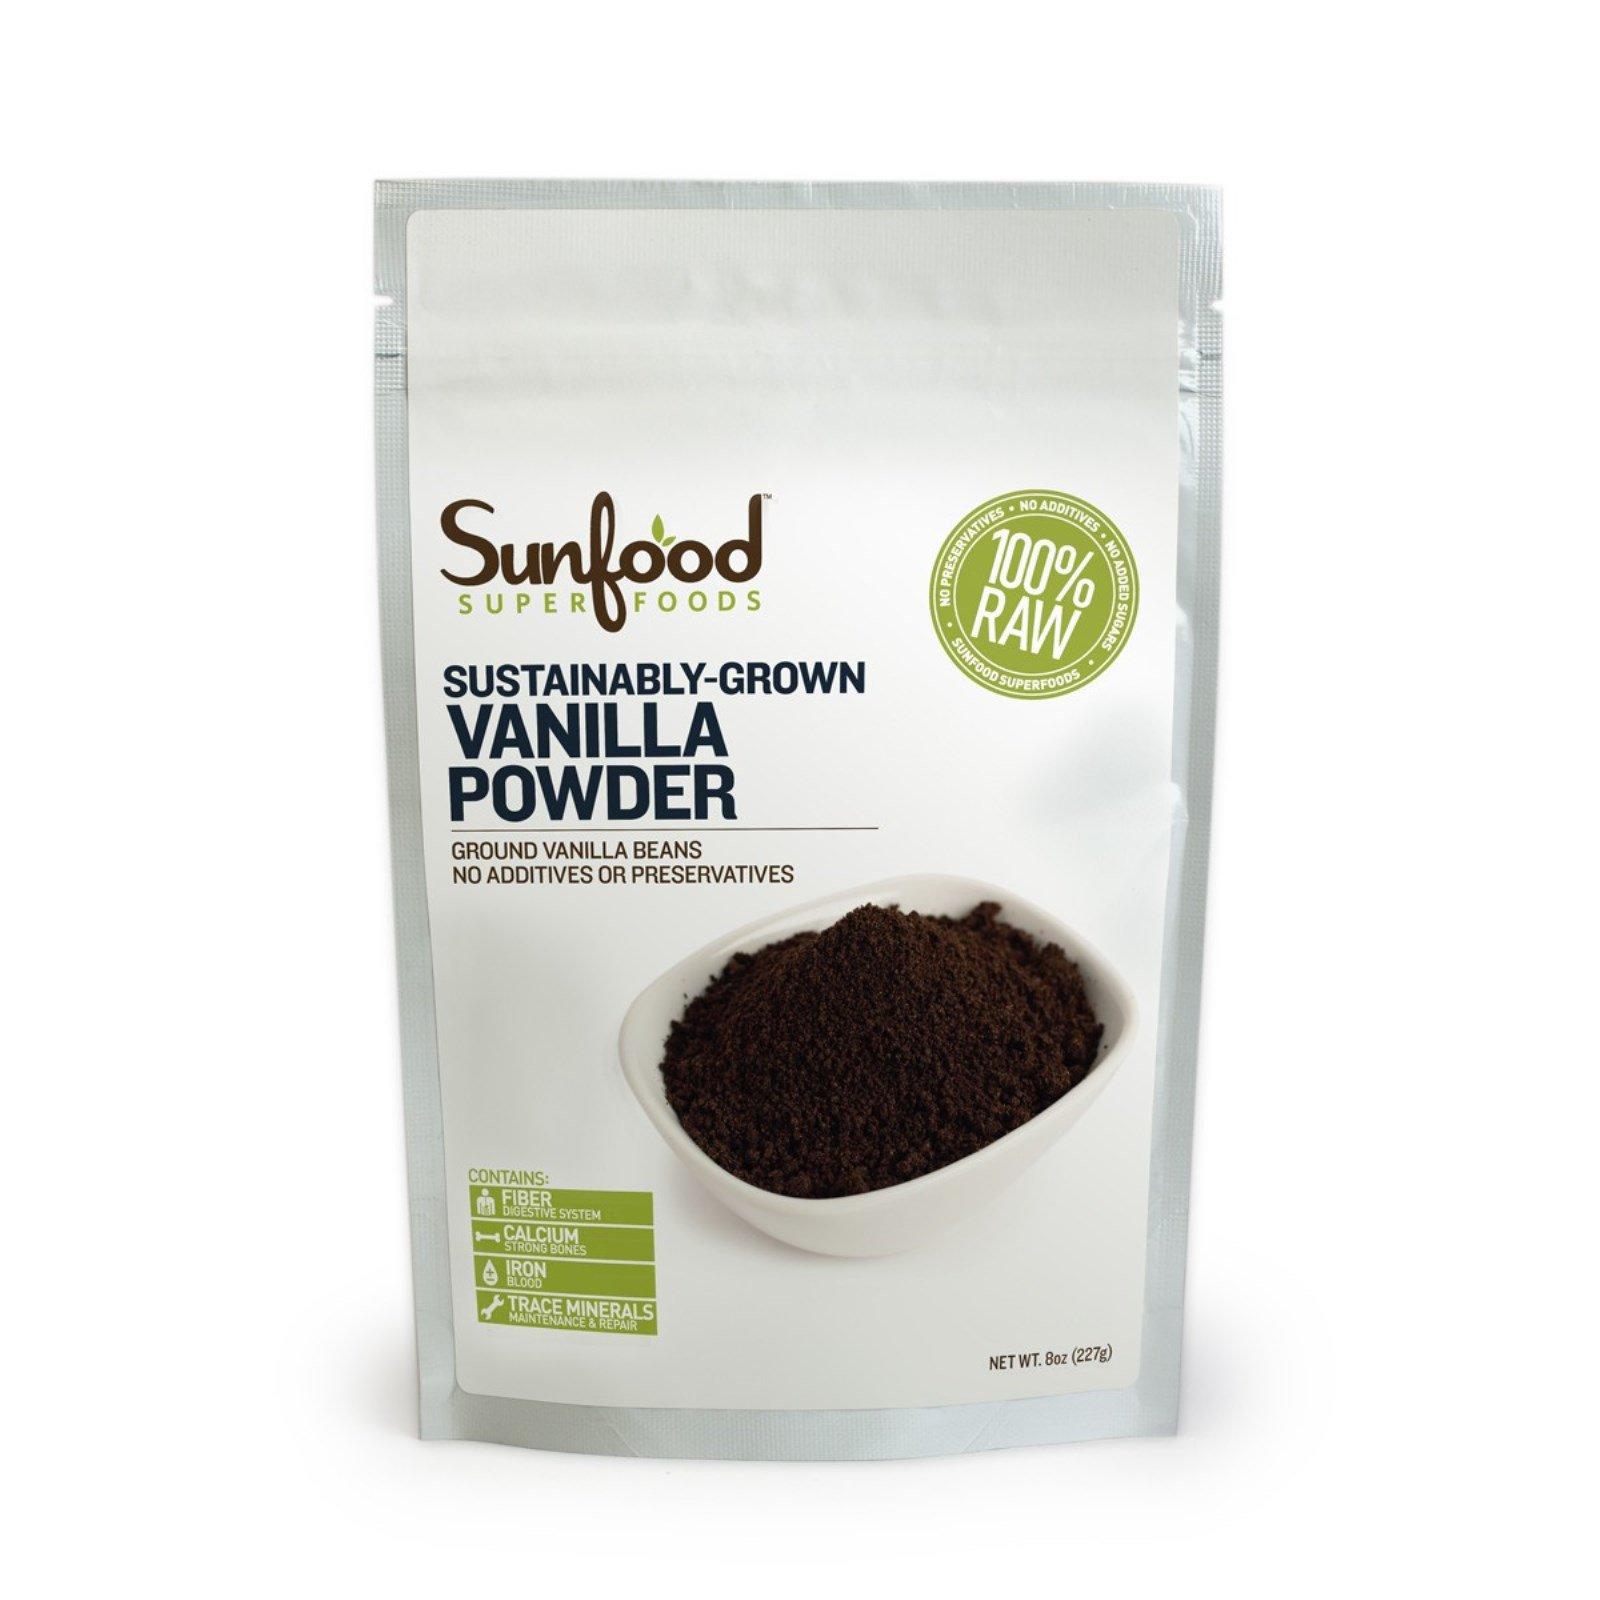 Sunfood pure vanilla powder